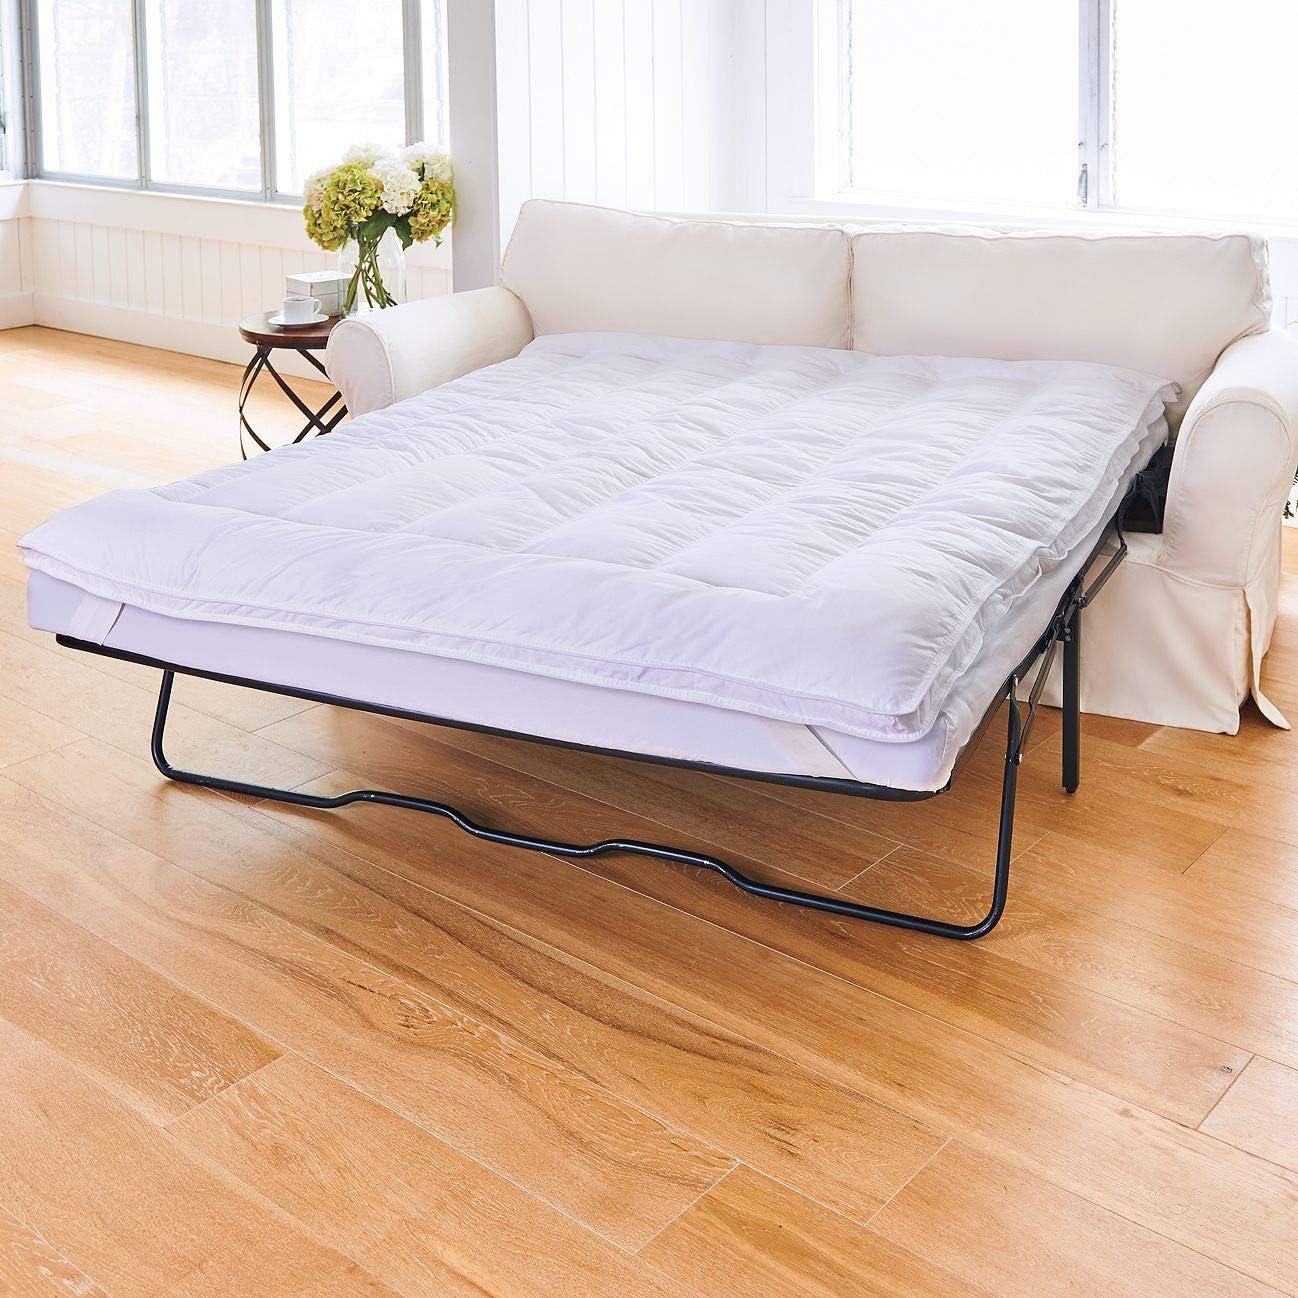 - Amazon.com: Sleeper Sofa Mattress Topper-Queen By Improvements